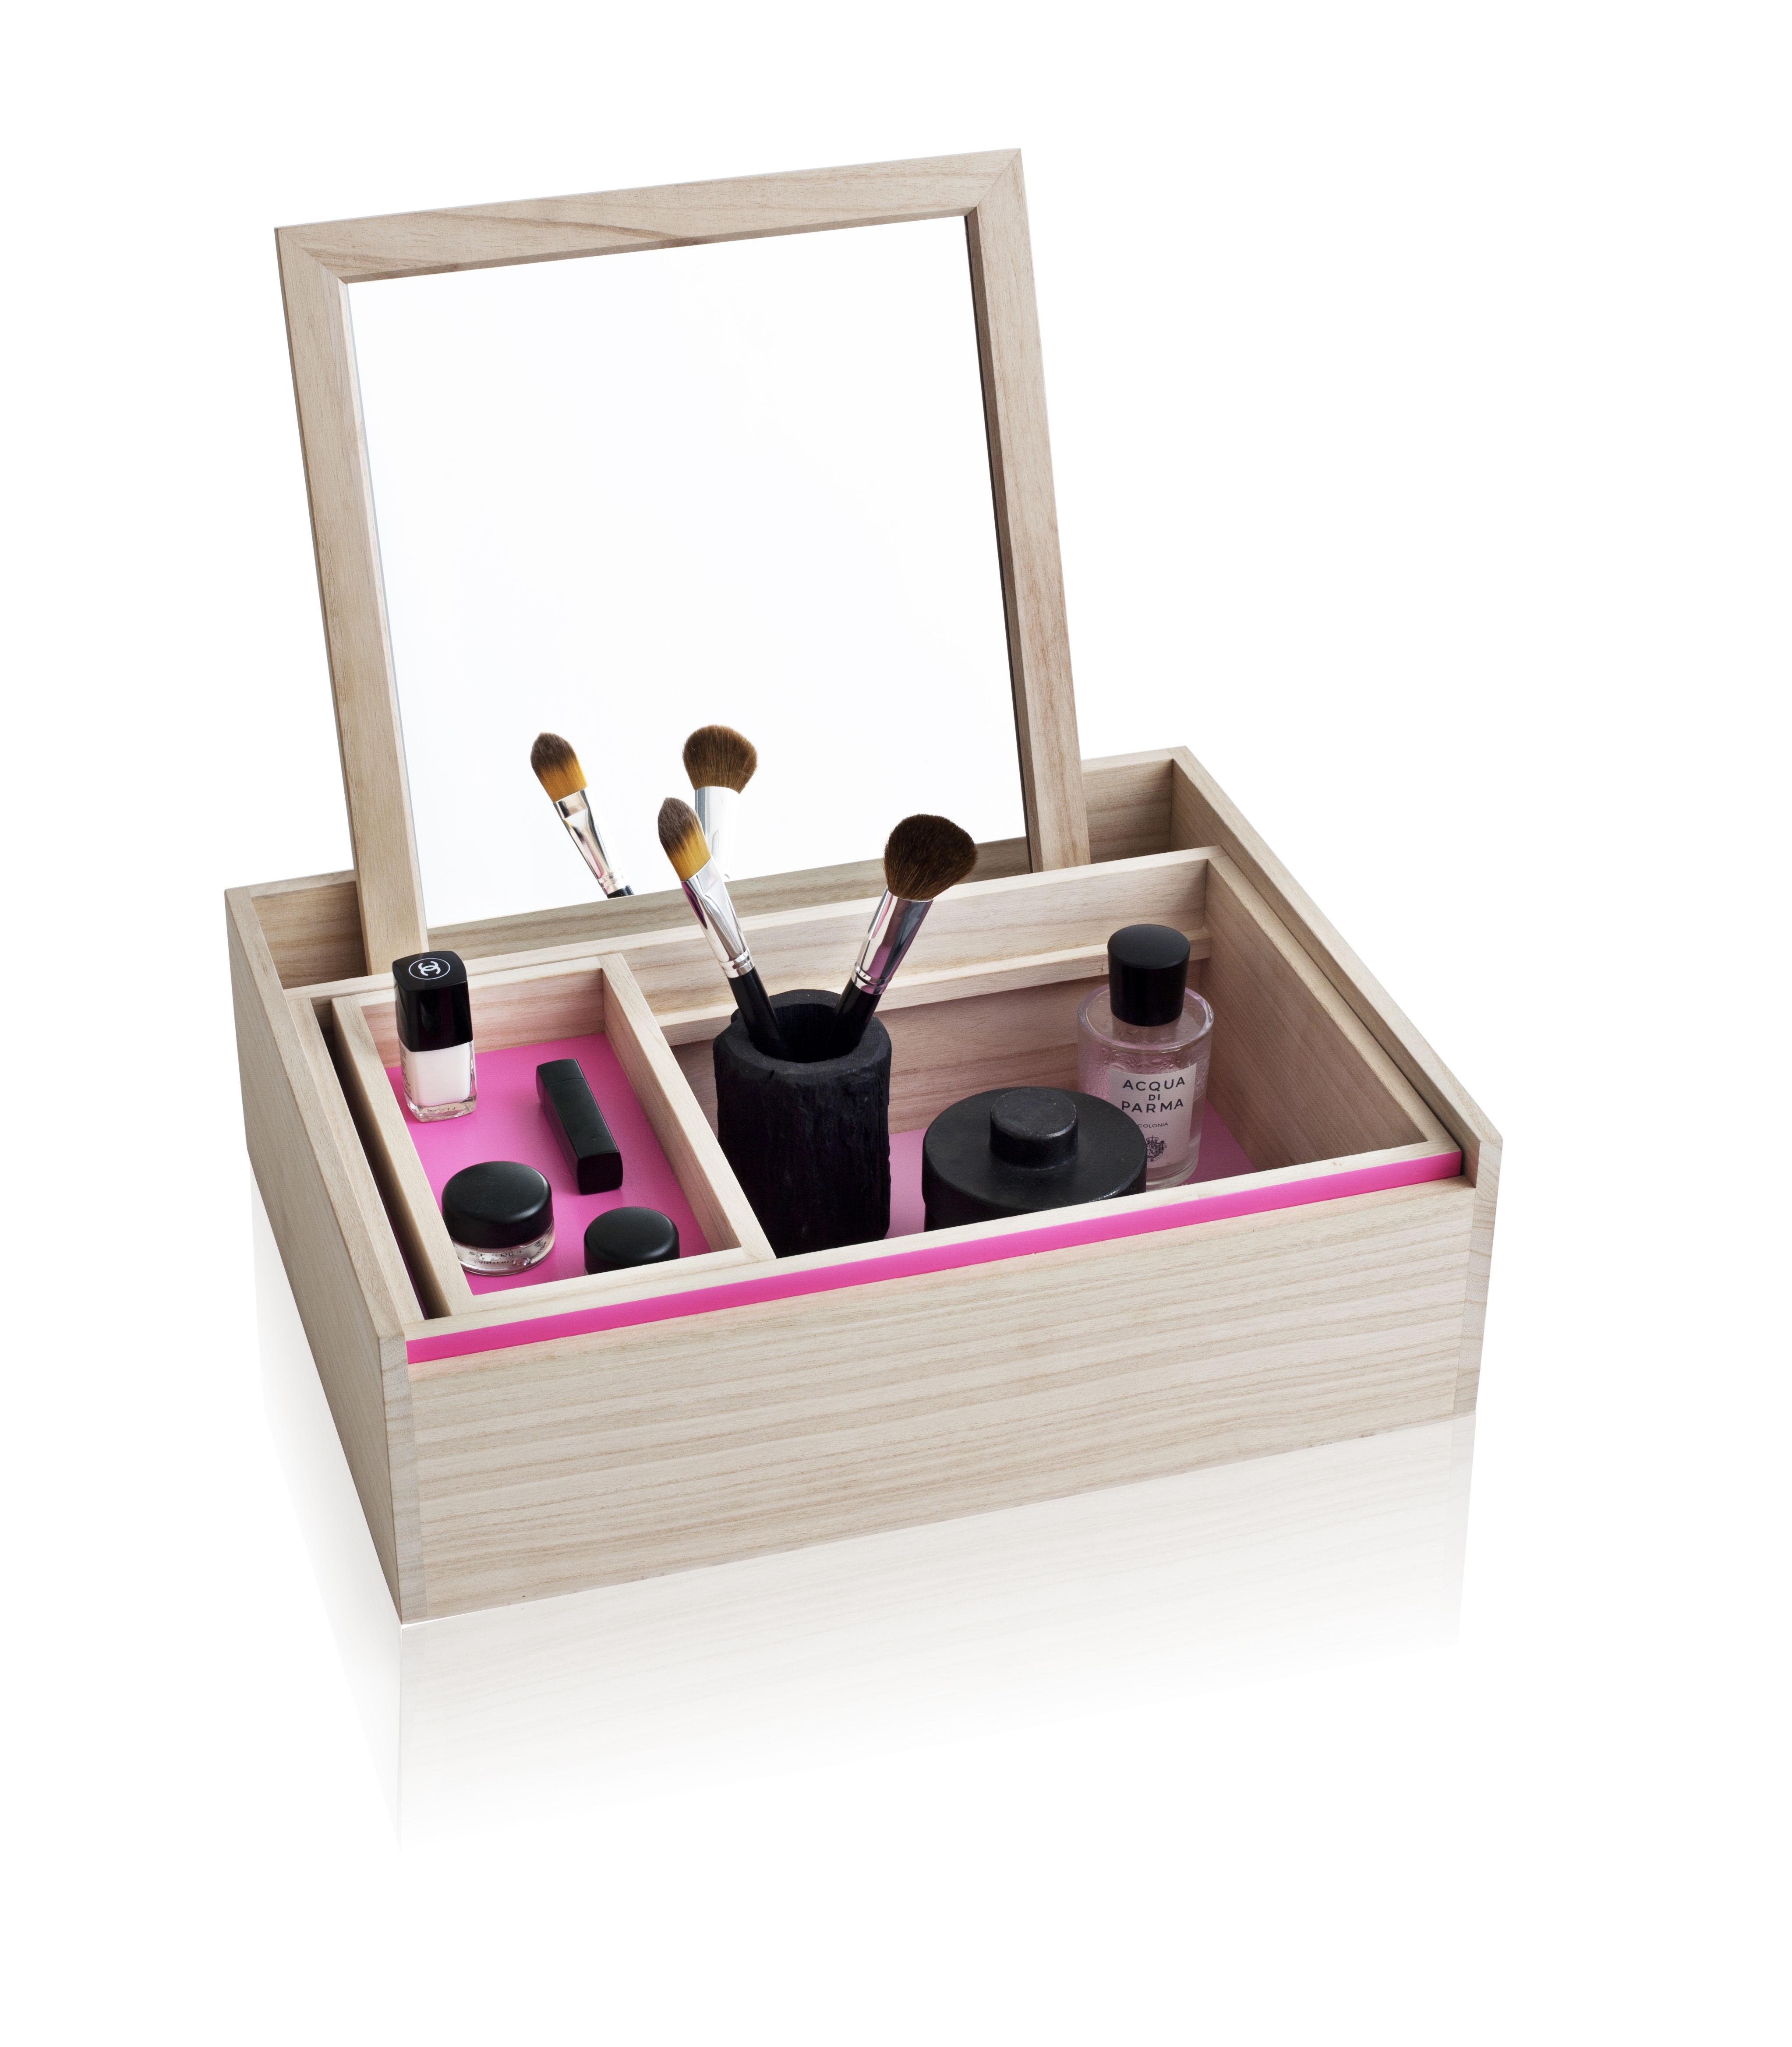 bo te bijoux balsabox personal coiffeuse 42 x 32 cm. Black Bedroom Furniture Sets. Home Design Ideas